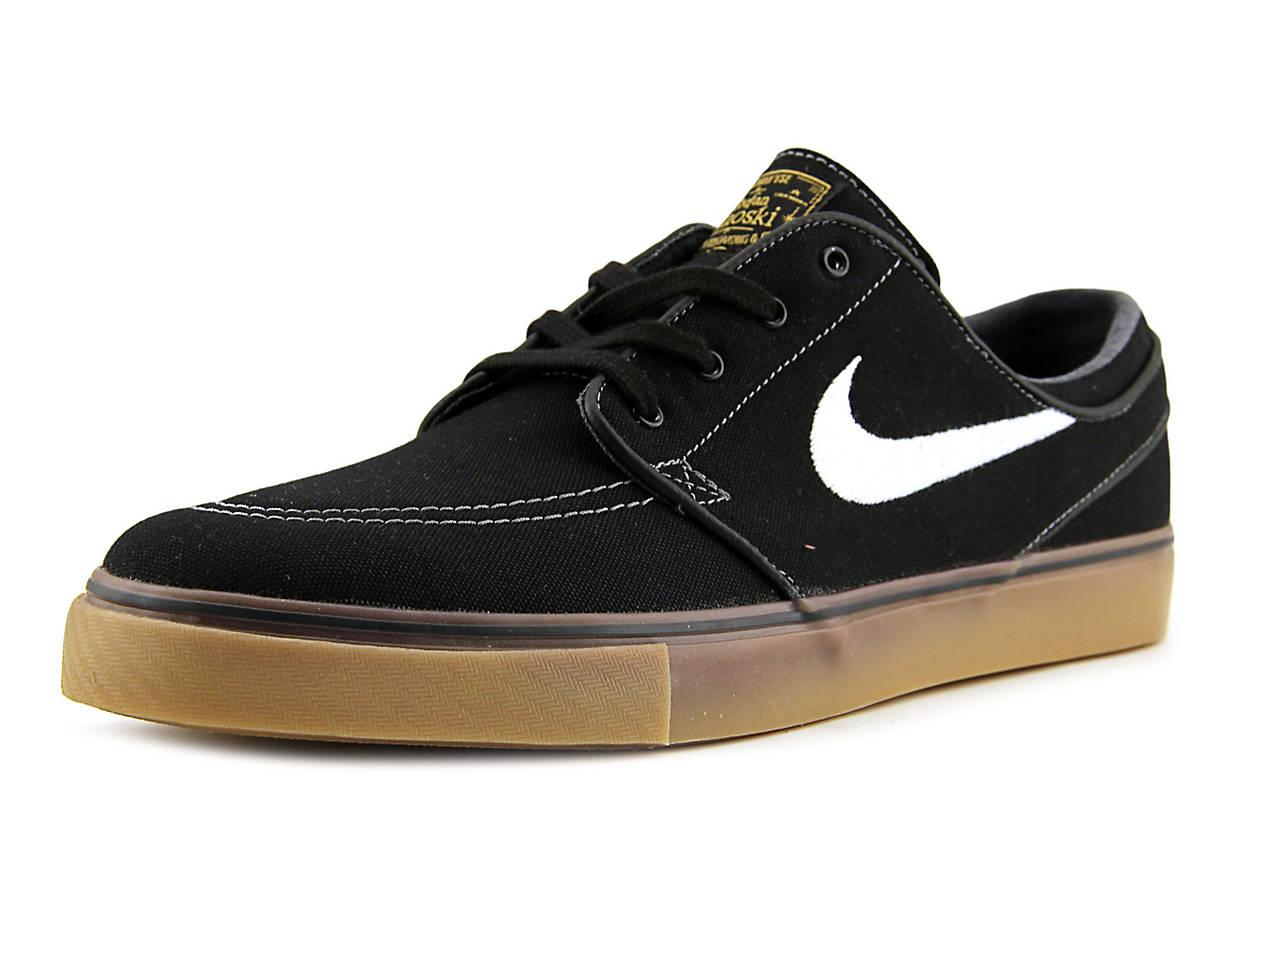 Nike Zoom Stefan Janoski Sneaker - Men s - FINAL SALE Men s Shoes  b24370e1a3